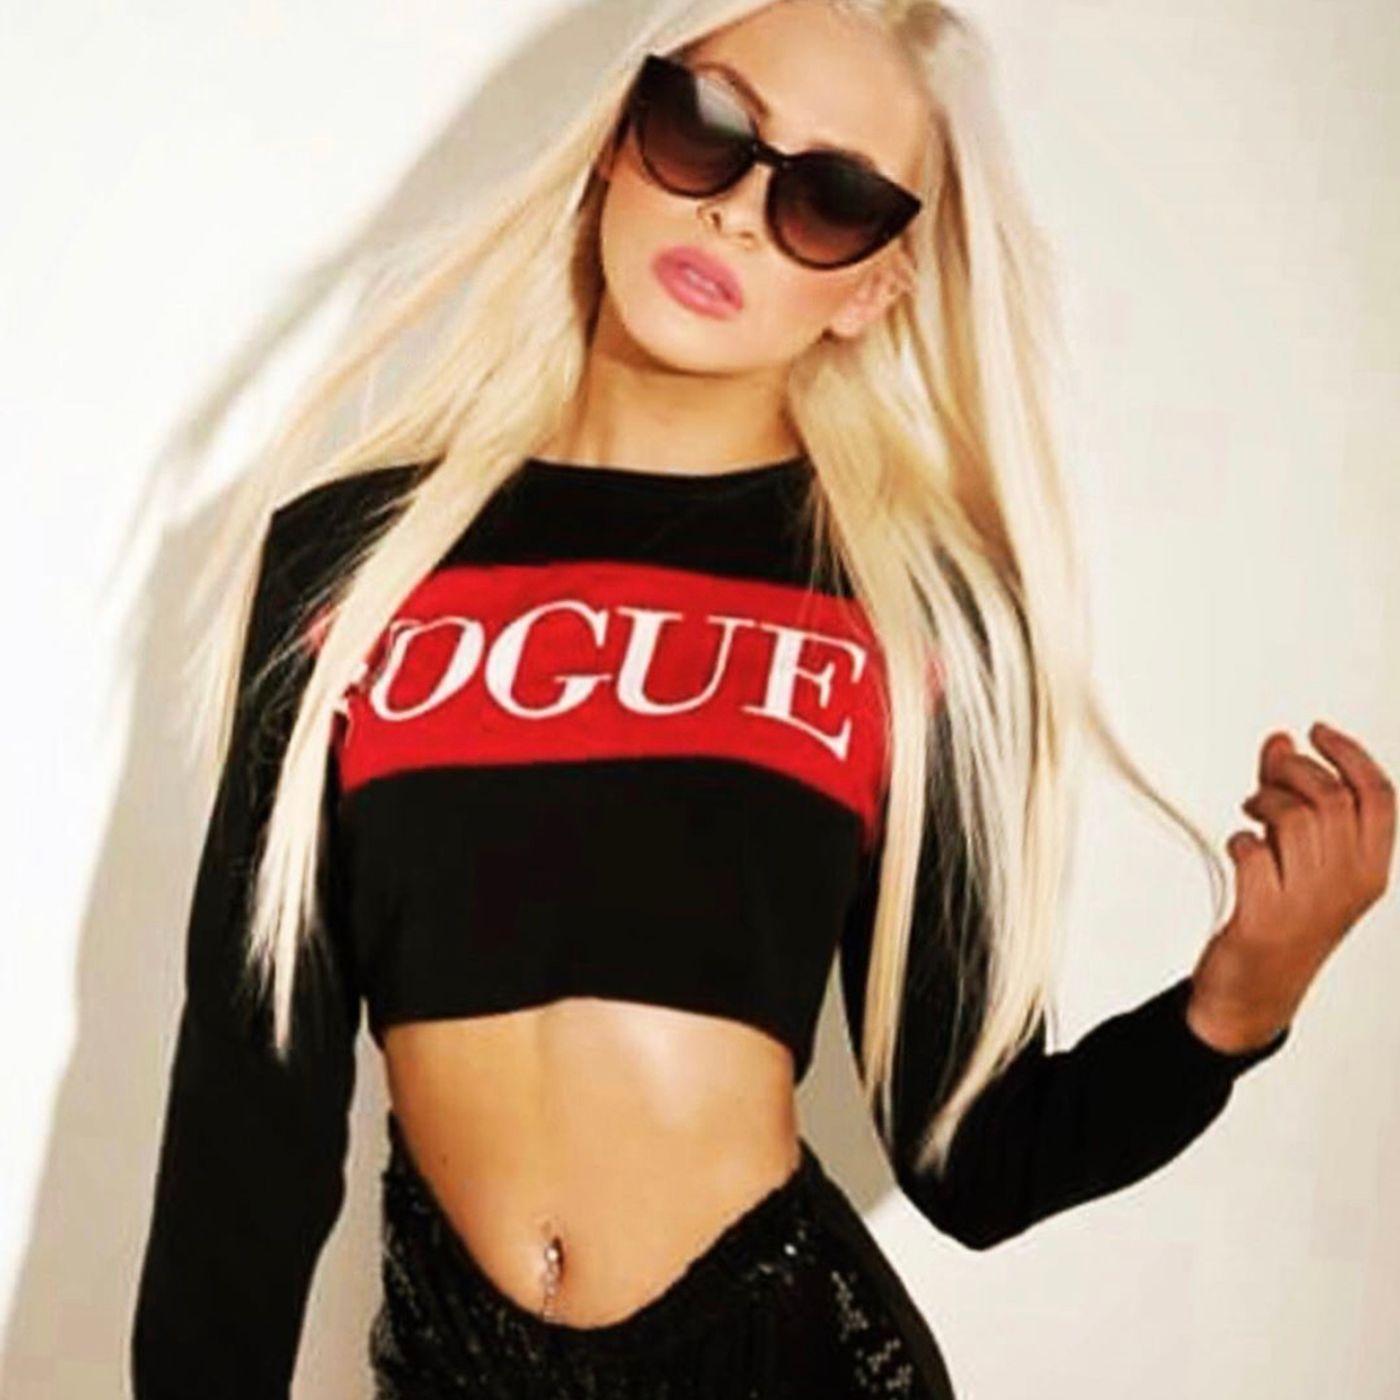 Deeper Than Music interviews actress, model and social media influencer Riley Sawyer